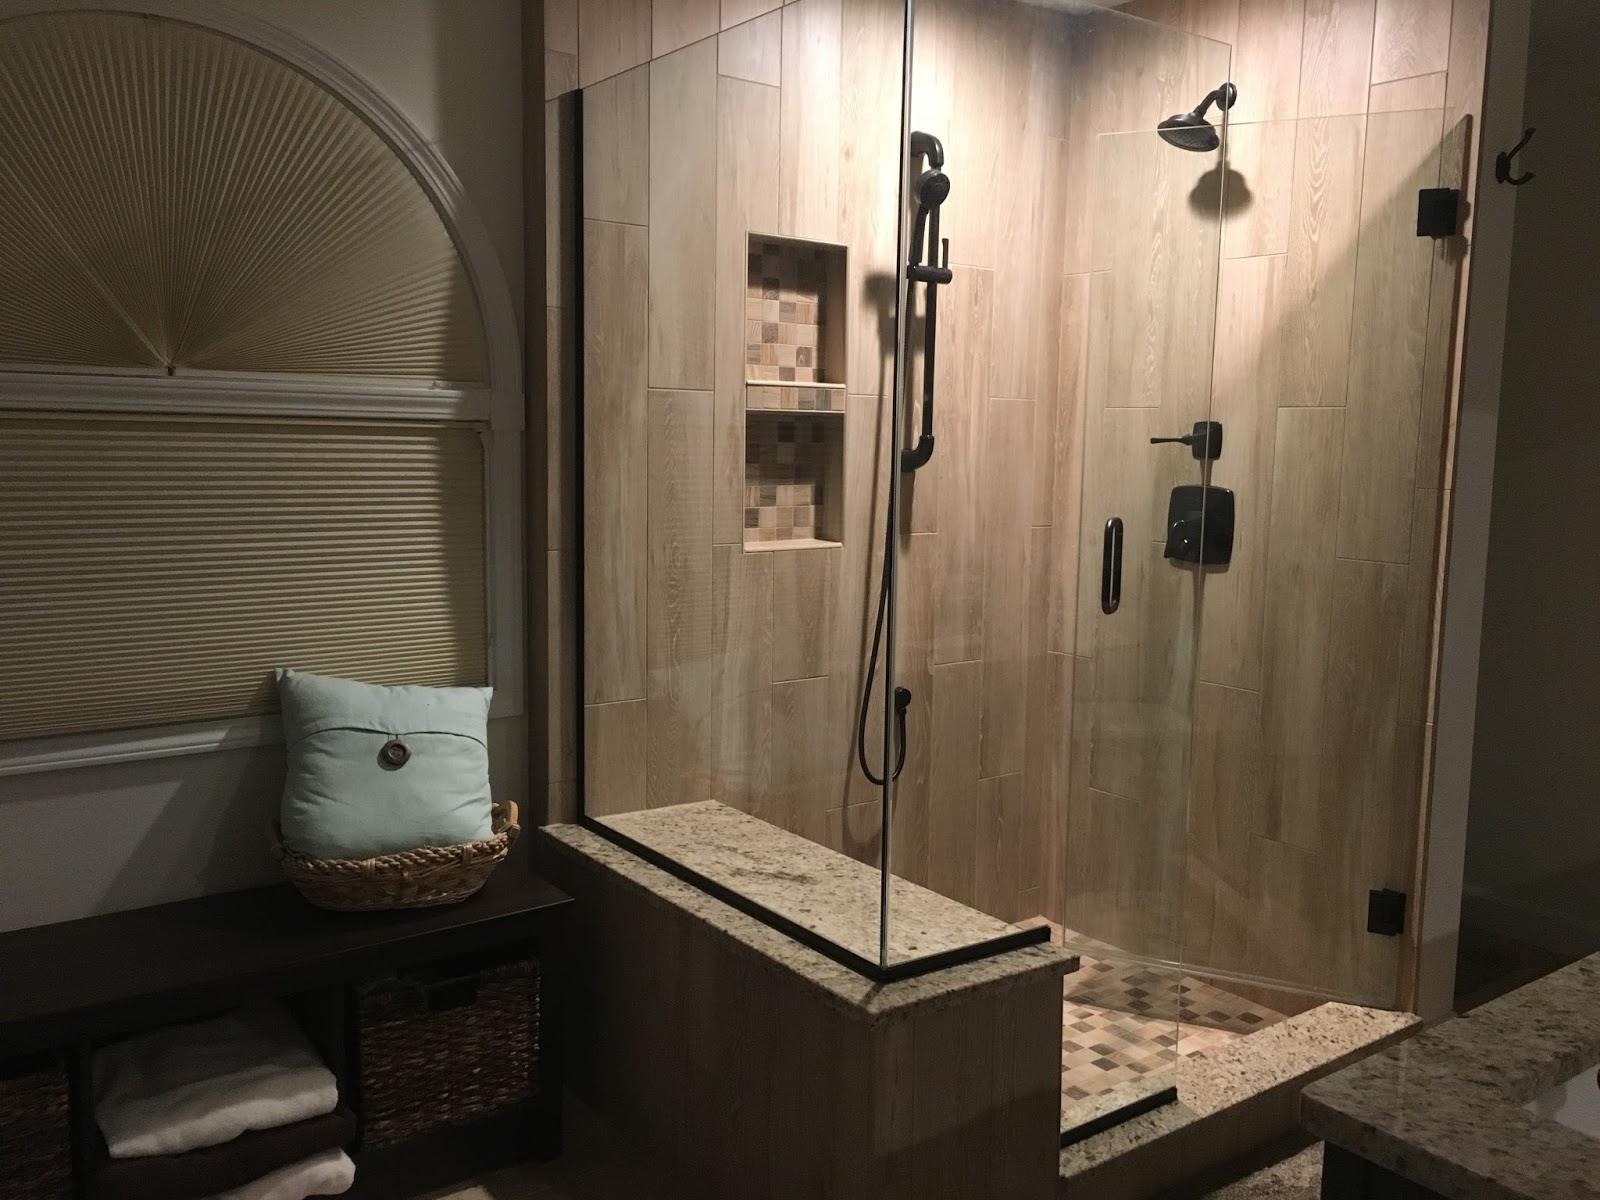 NEW SHOWER DOOR TURNED REMODELED BATHROOM – Calvetta Brothers